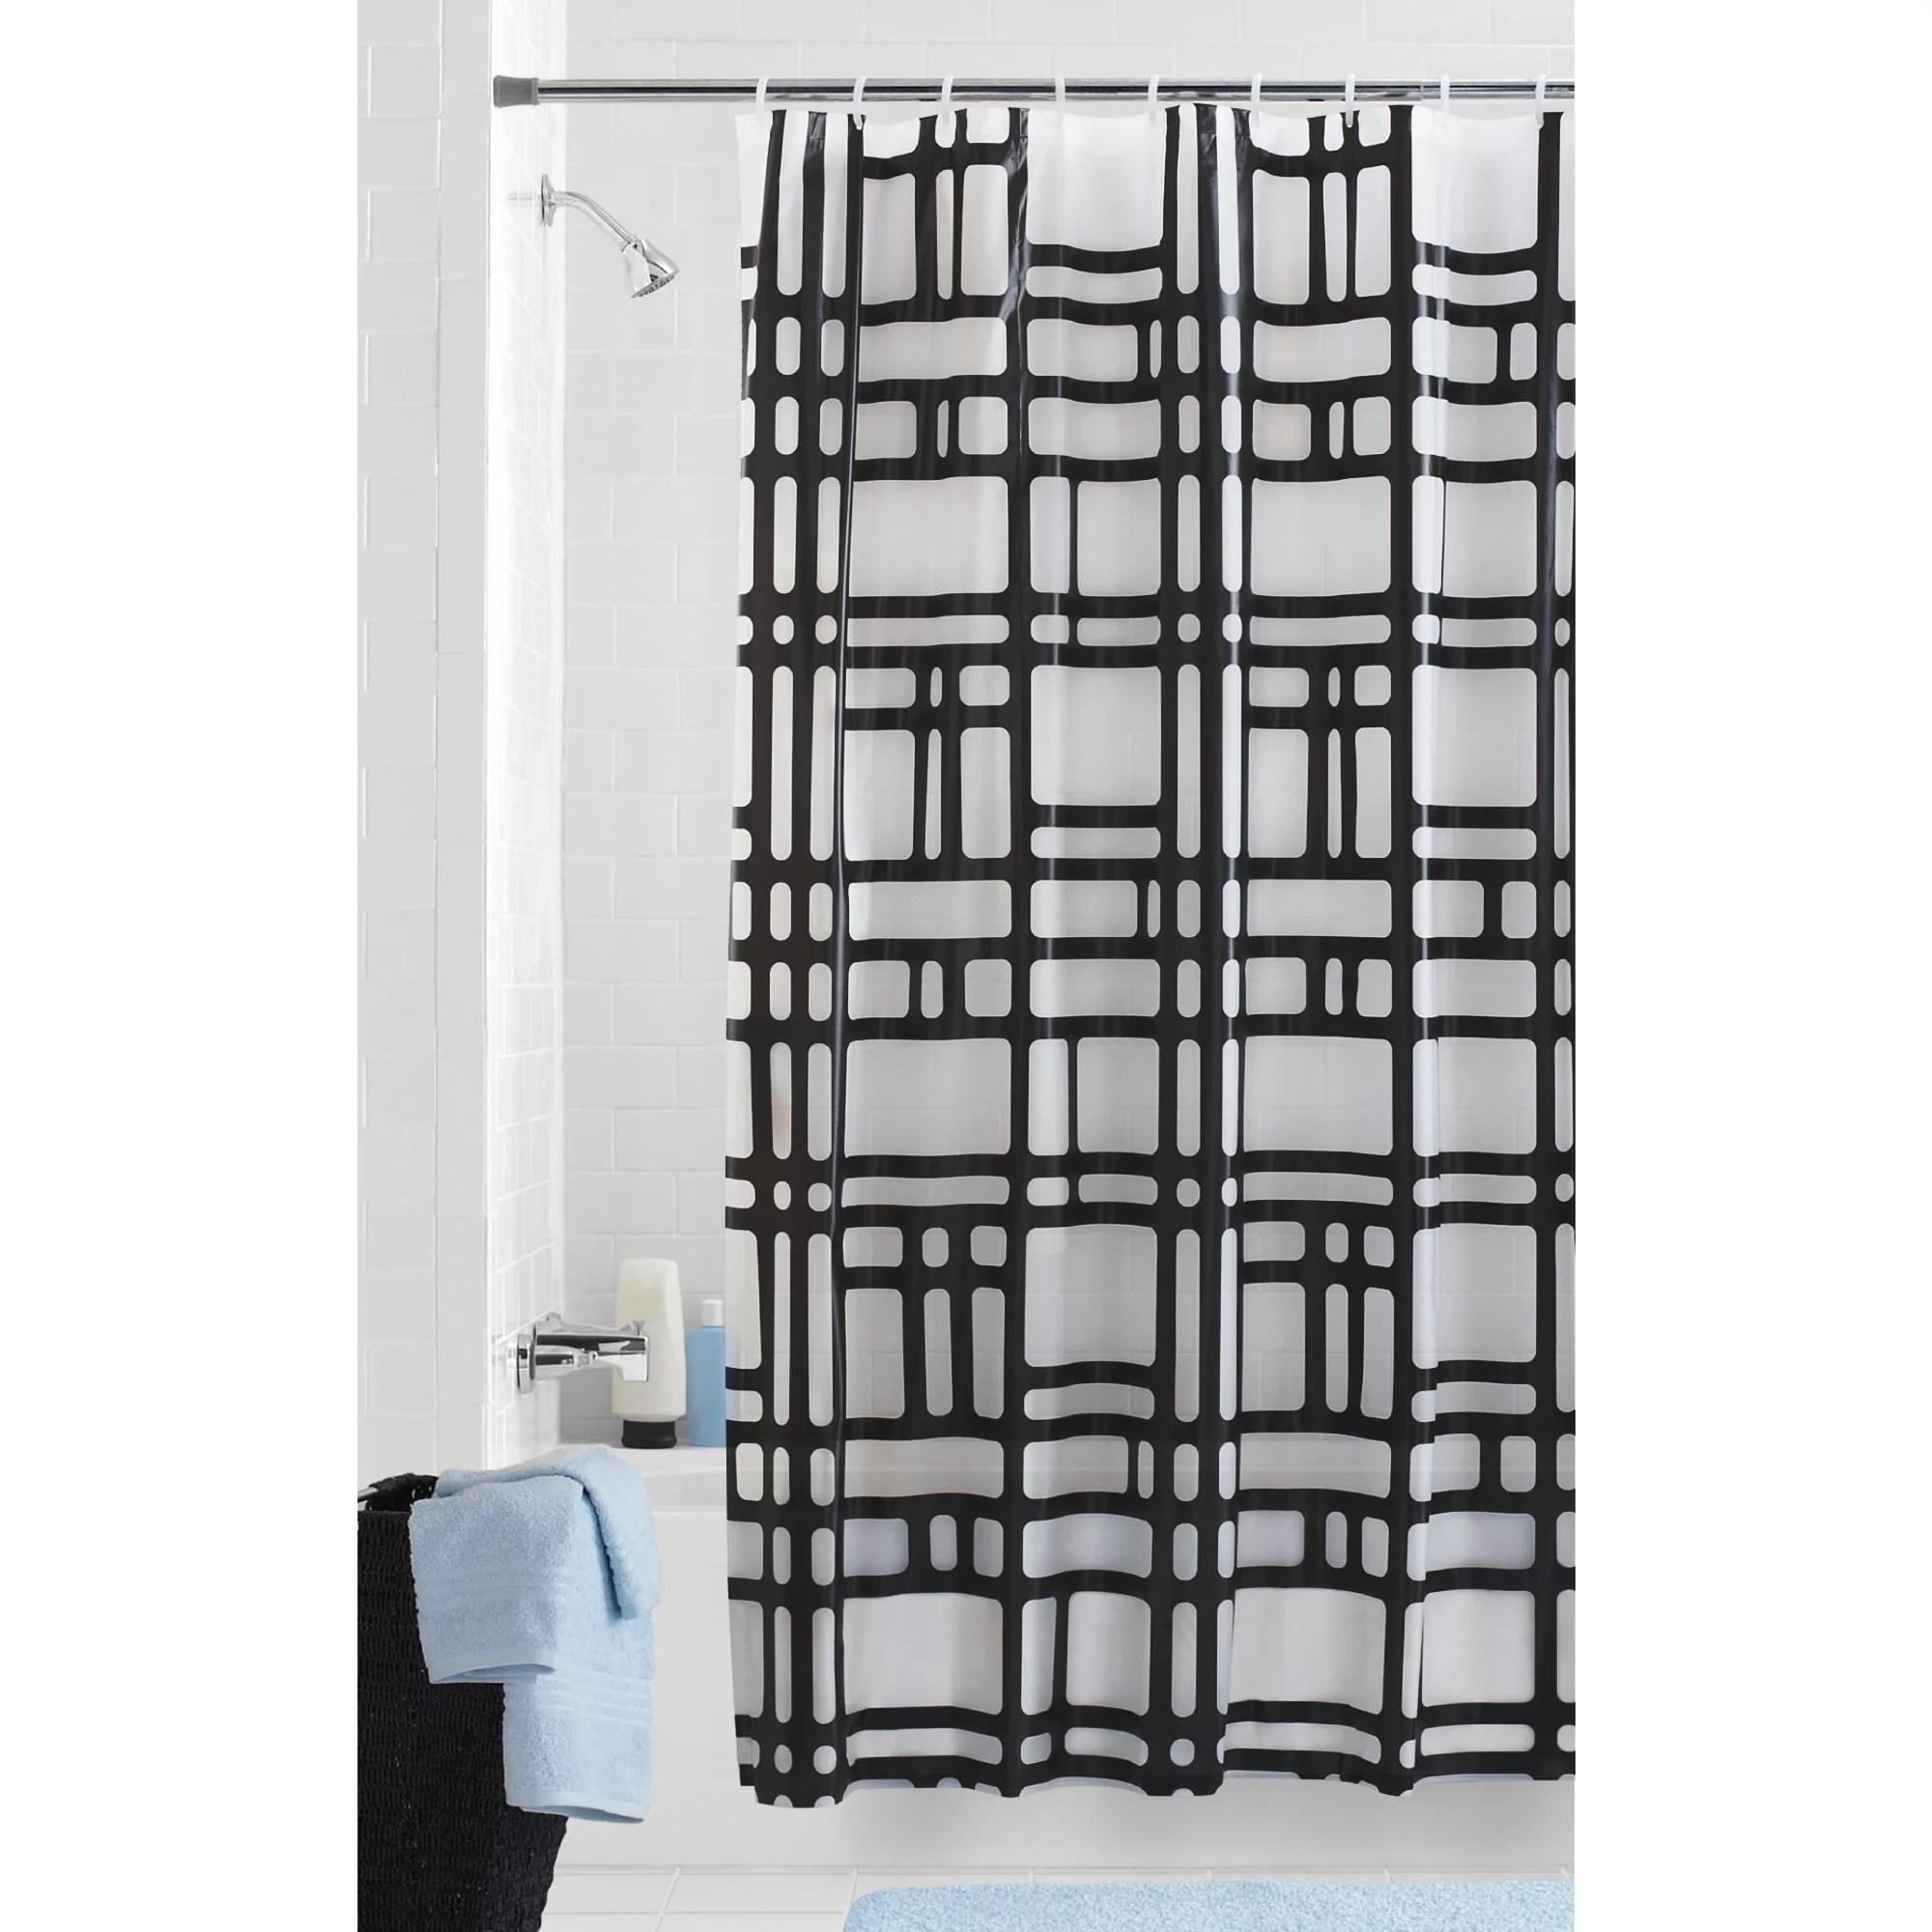 mainstays elements geometric peva shower curtain patterned 70 x 72